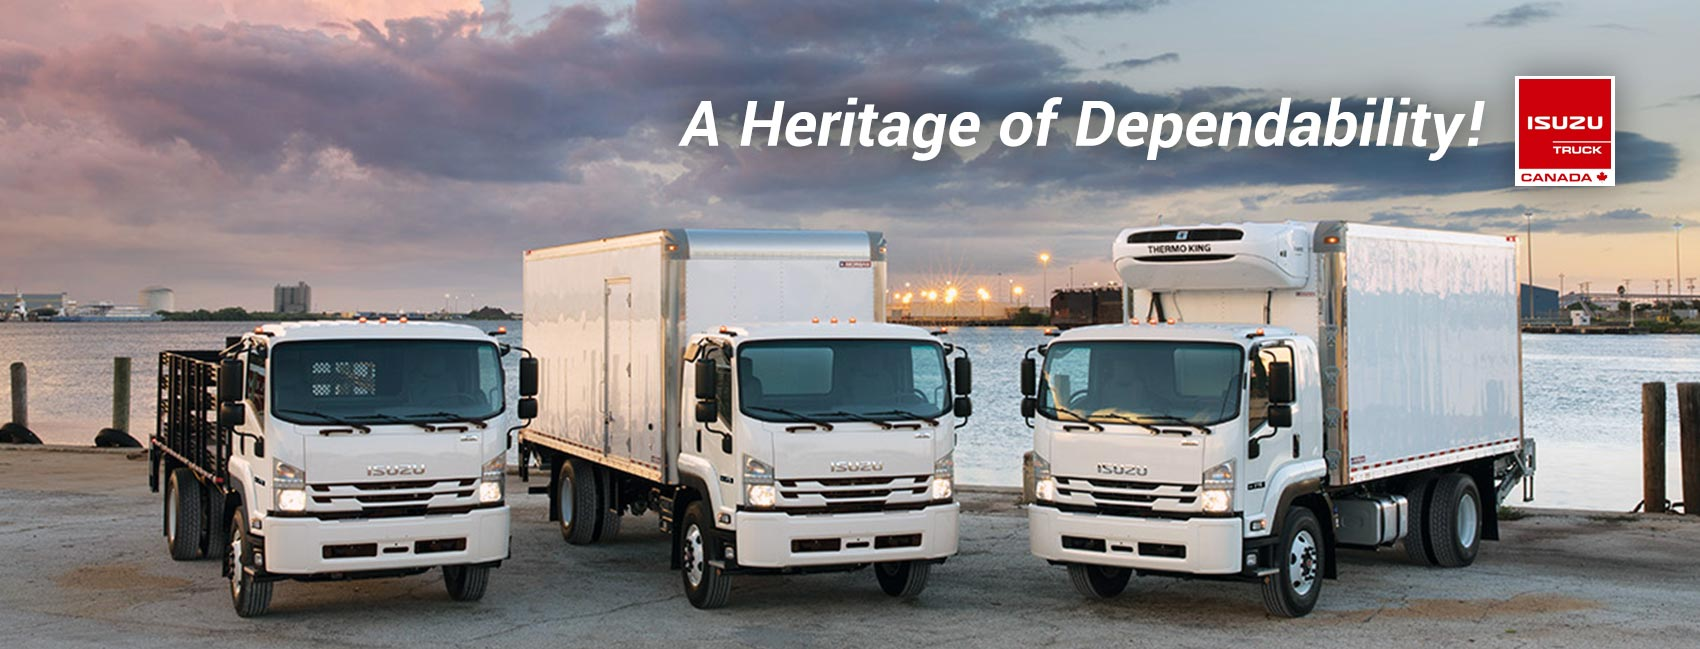 Heritage of Dependability